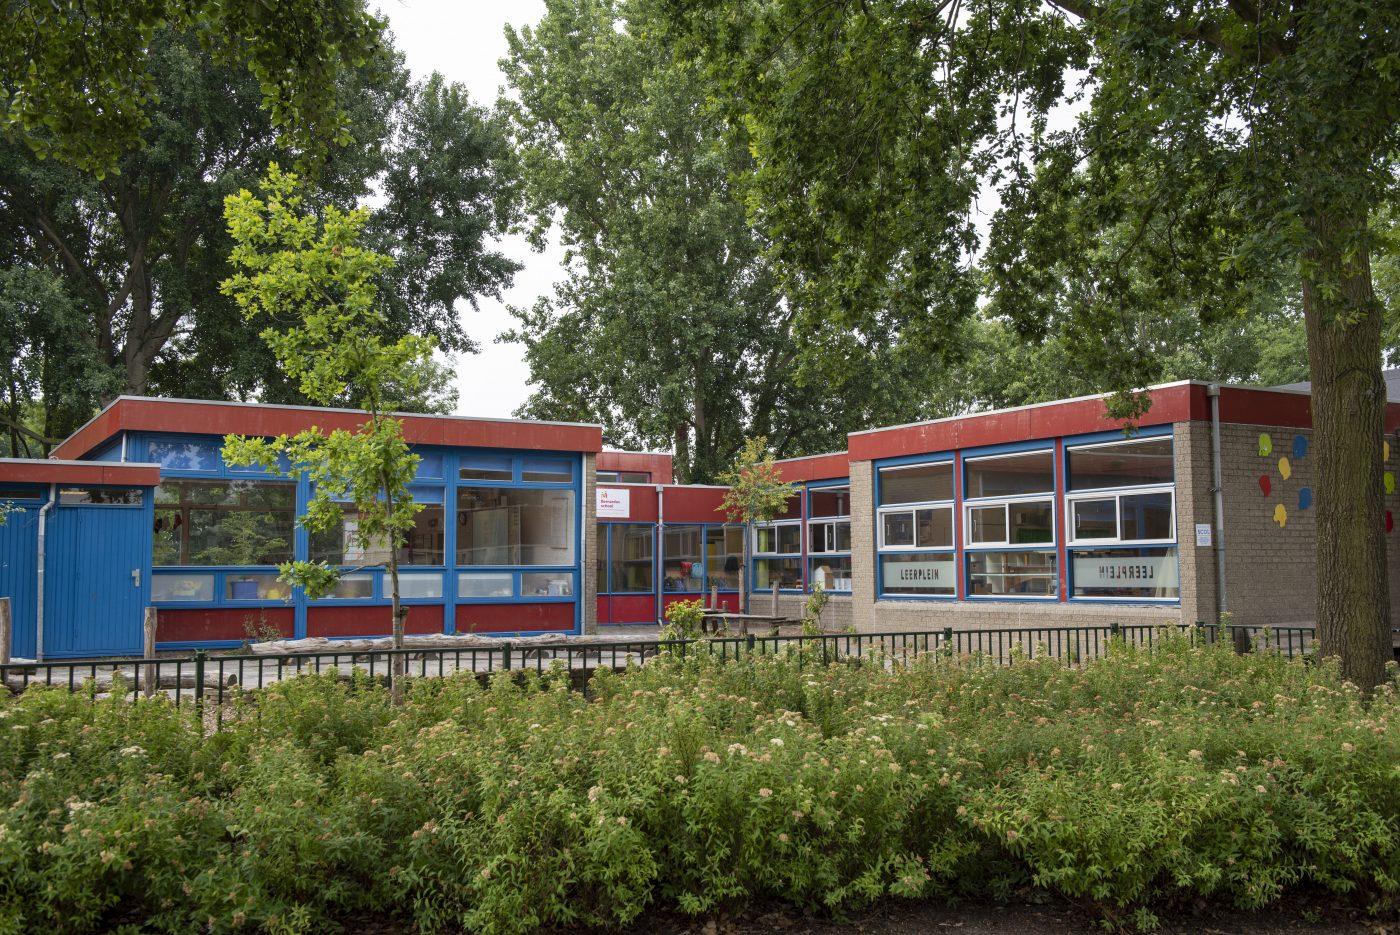 rk bernardusschool